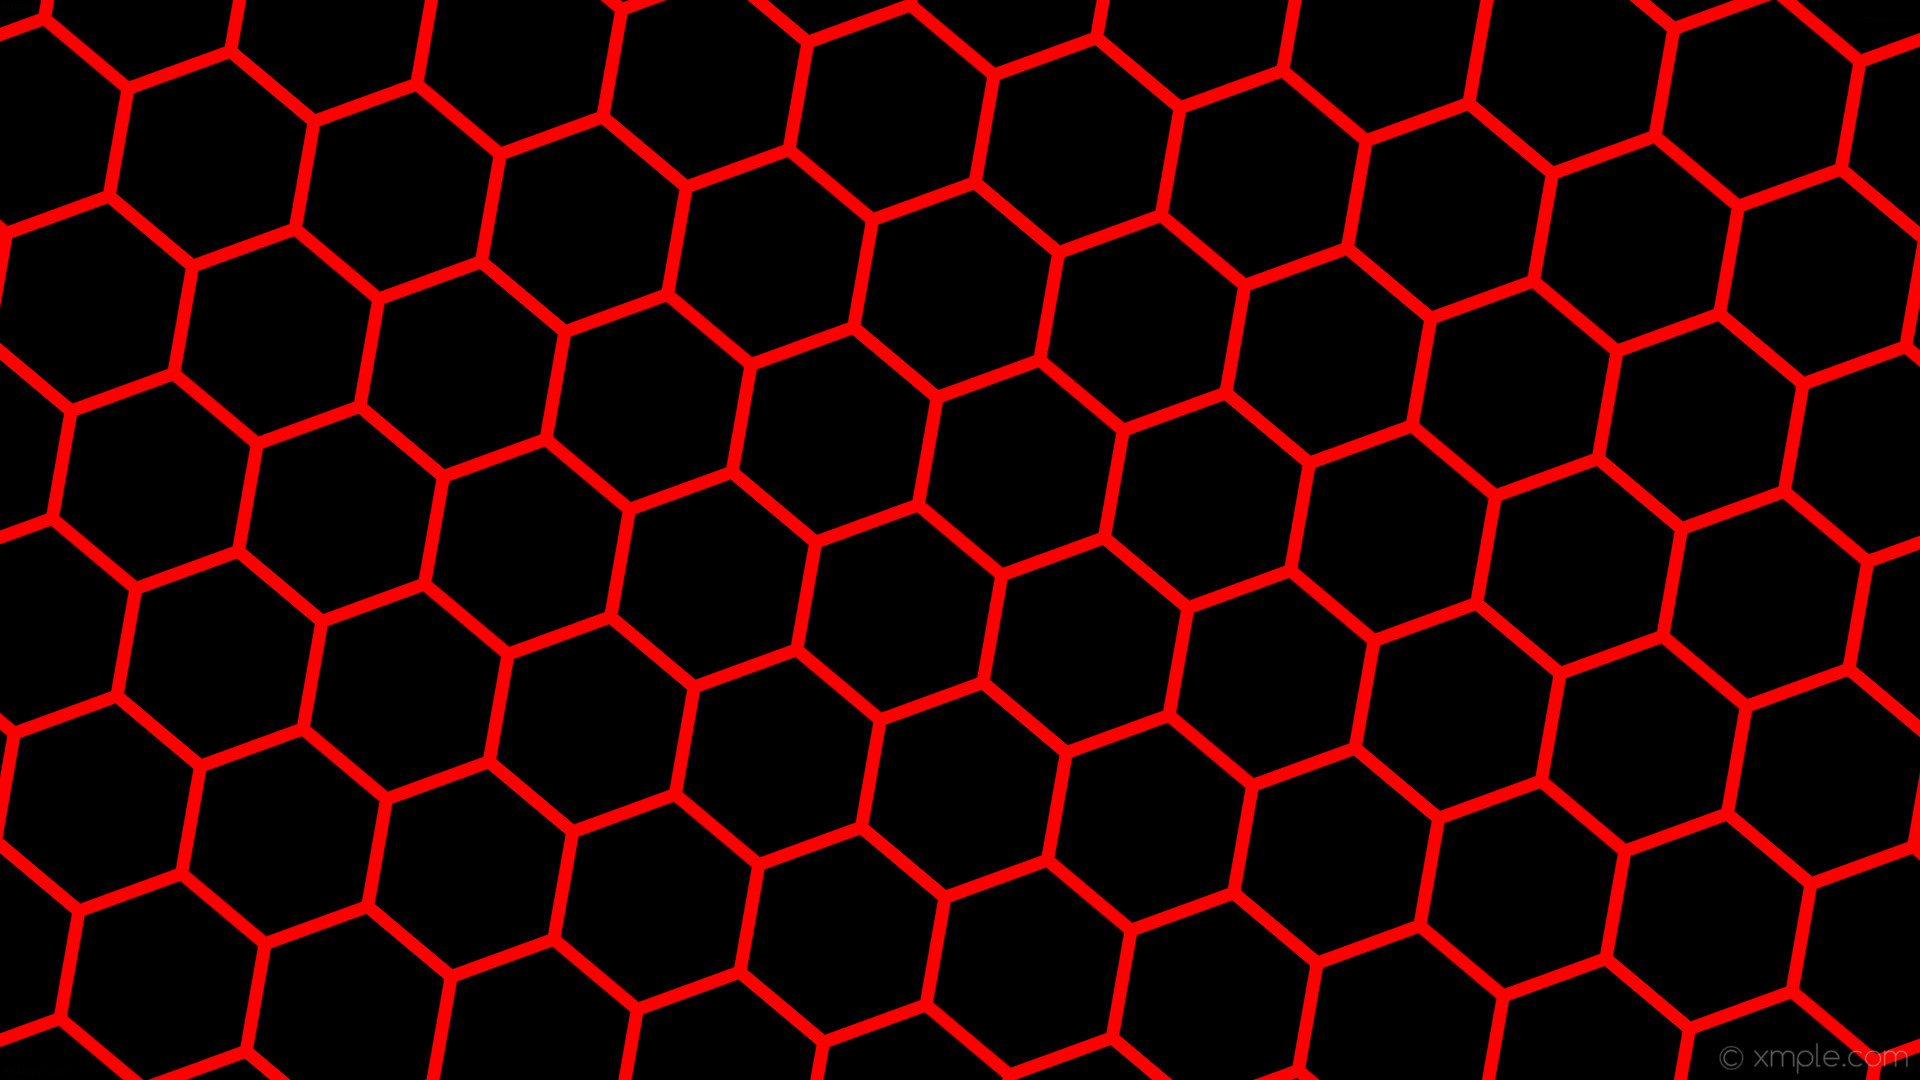 wallpaper beehive honeycomb black red hexagon #000000 #ff0000 diagonal 50°  13px 189px